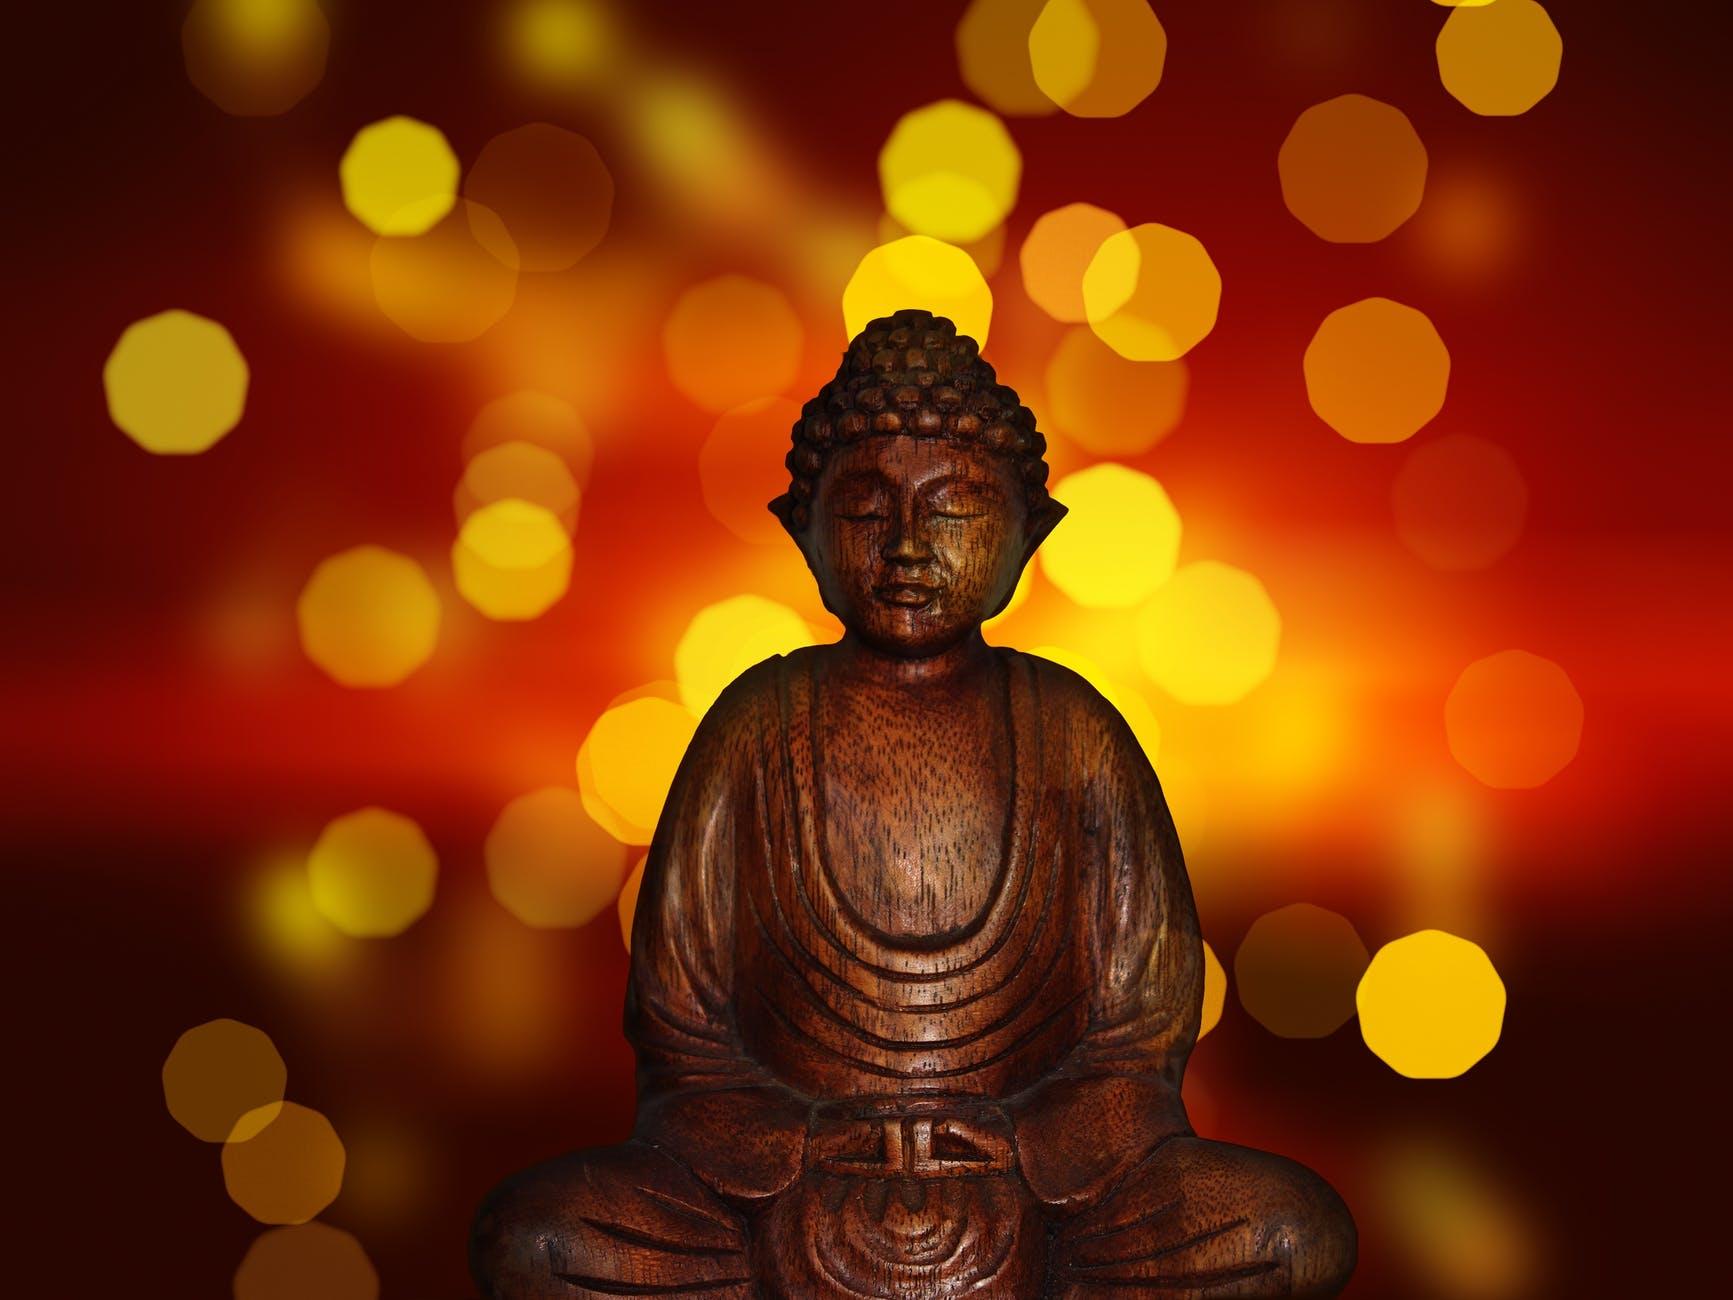 buddha-buddhism-statue-religion-46177.jpeg